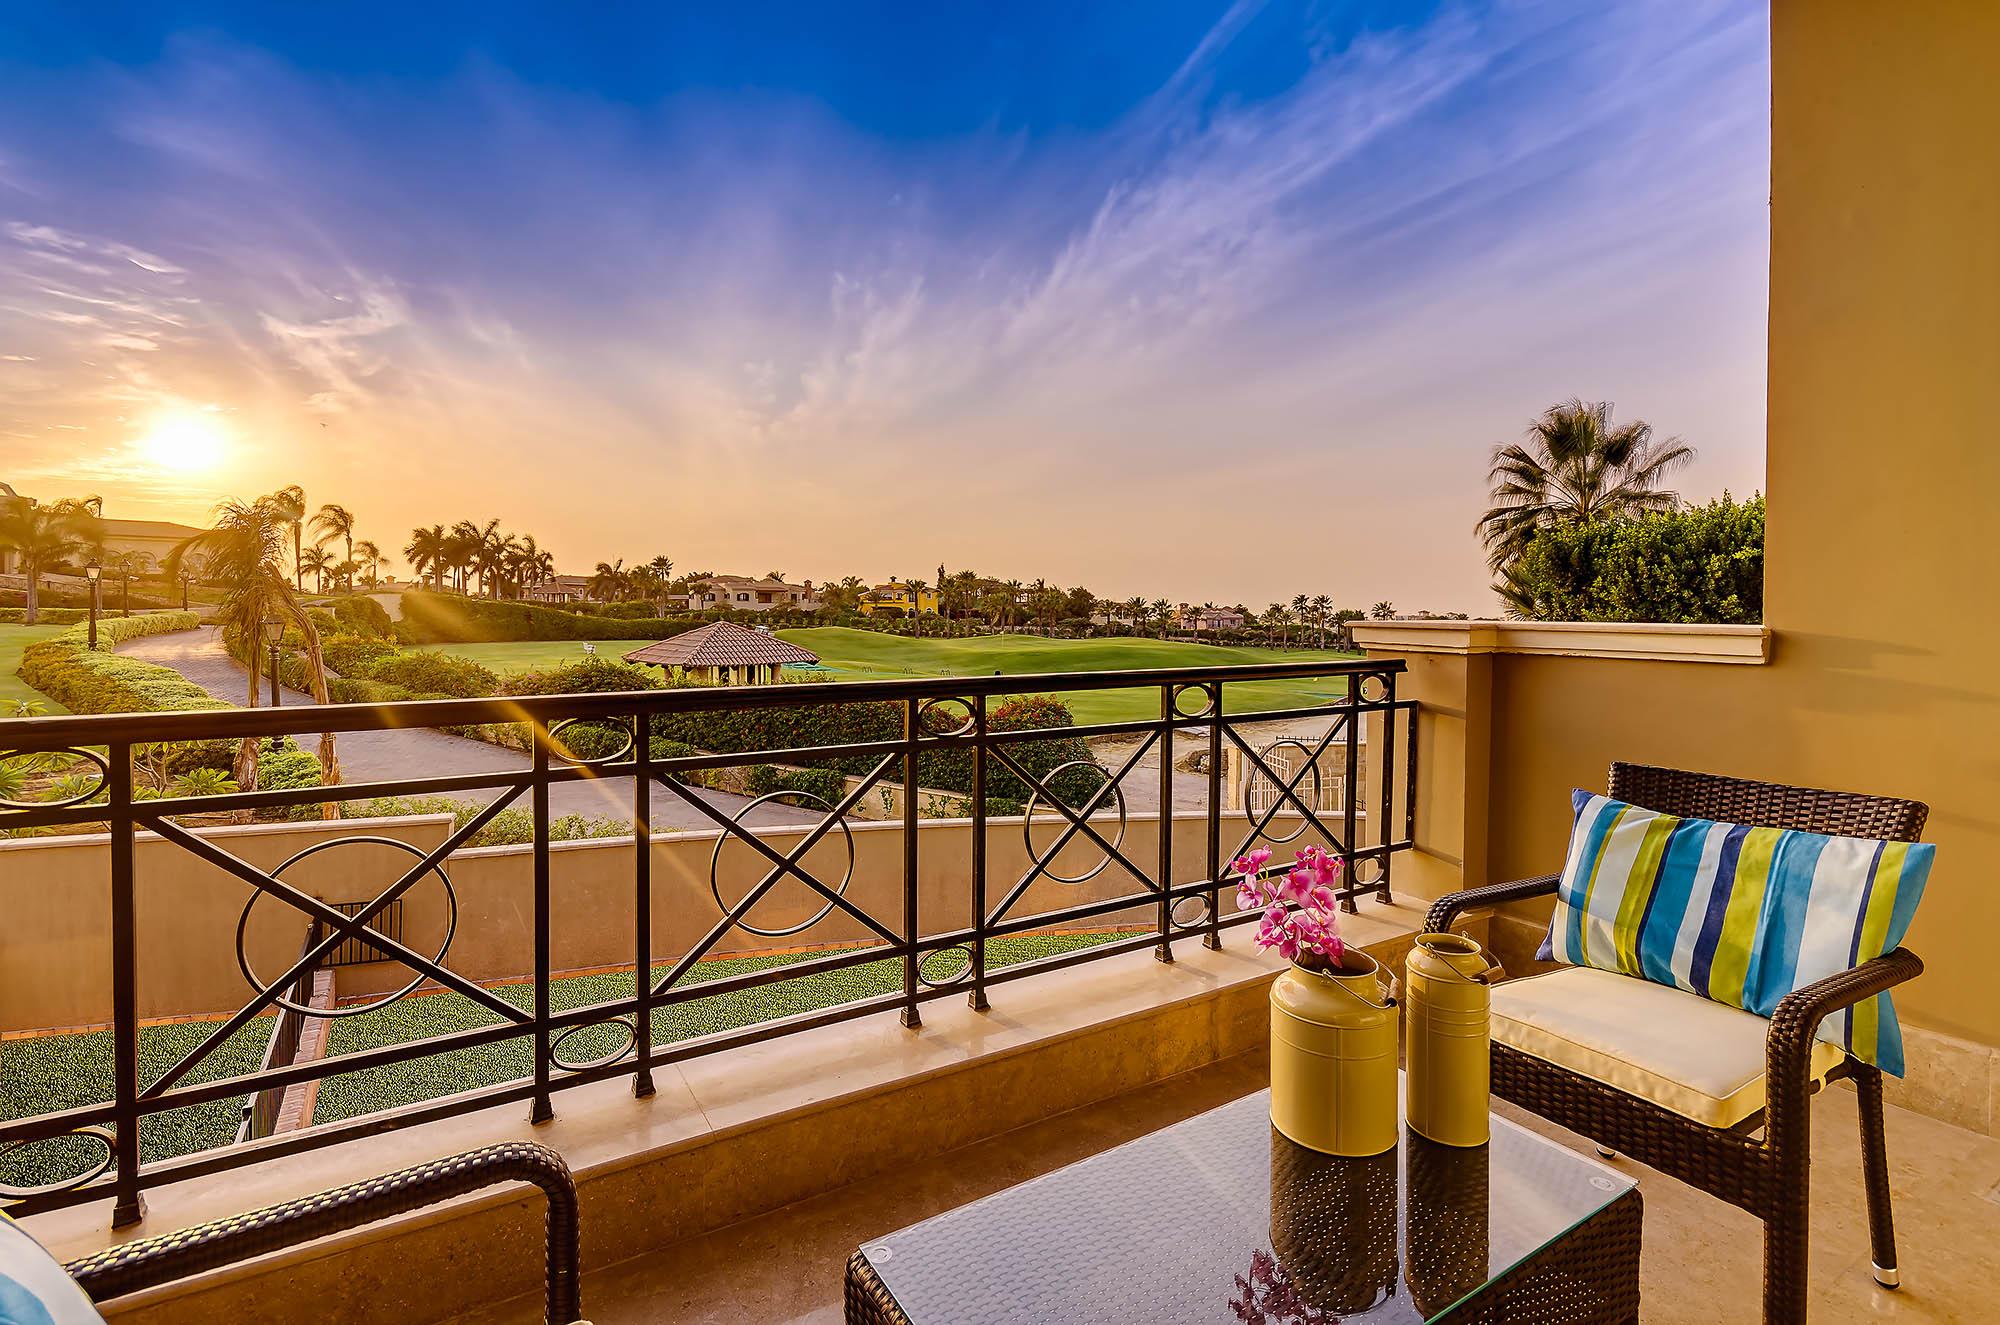 Balcony view sunset - HSI - Katameya heights - Interiors photography Egypt - Mohamed Abdel-Hady